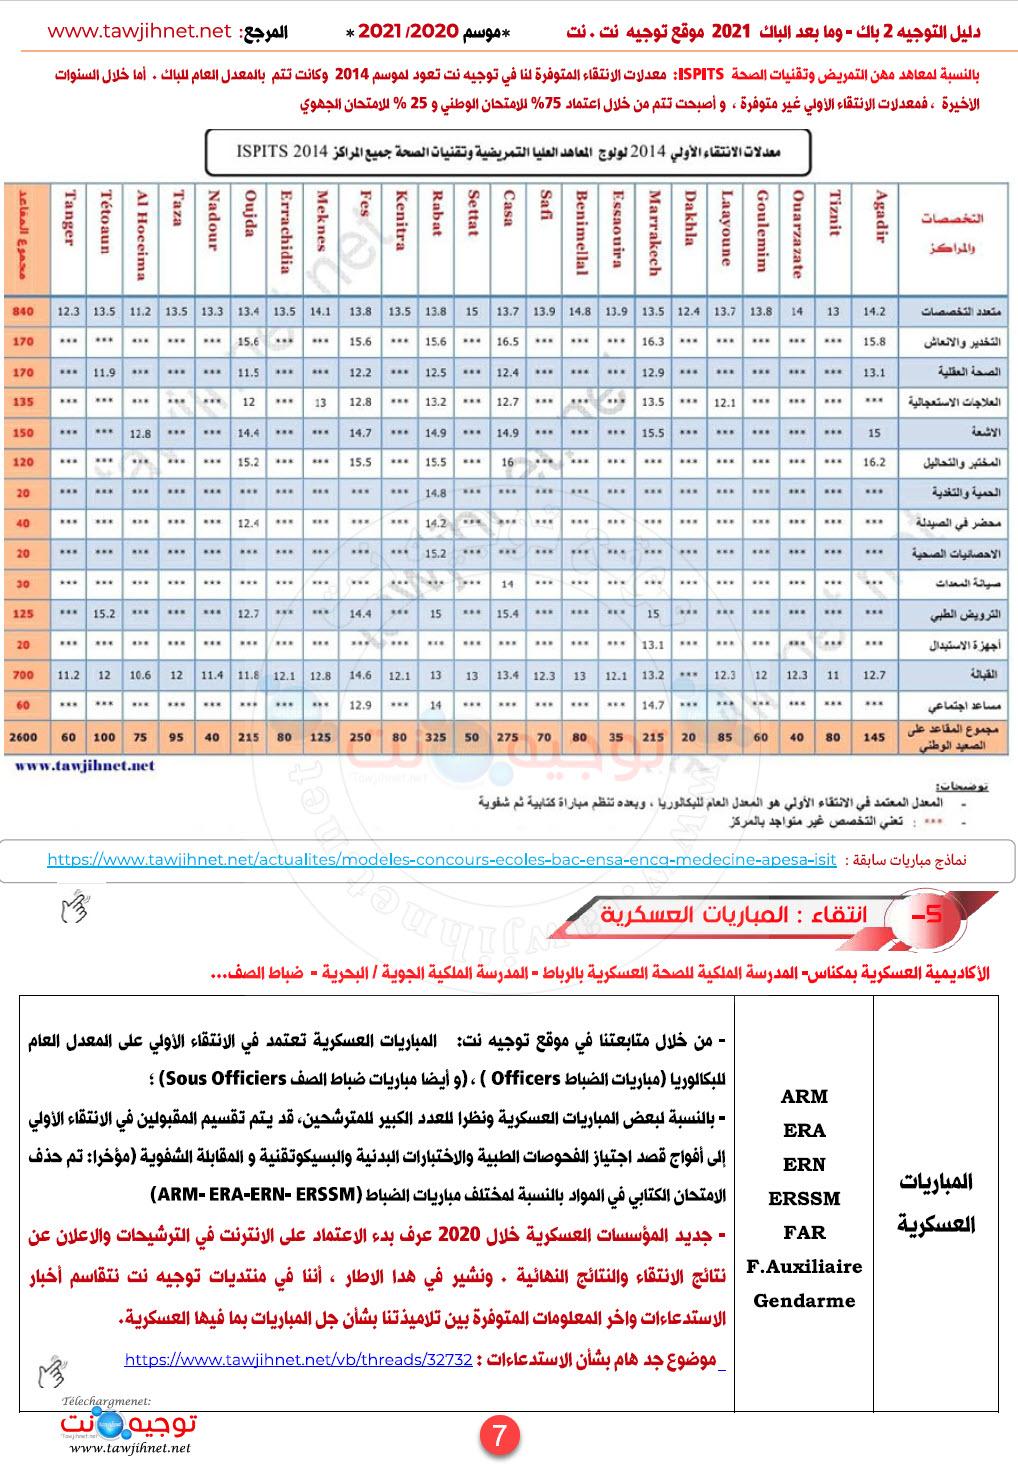 seuils-preselection-ecoles-instituts-maroc-2021_Page_7.jpg